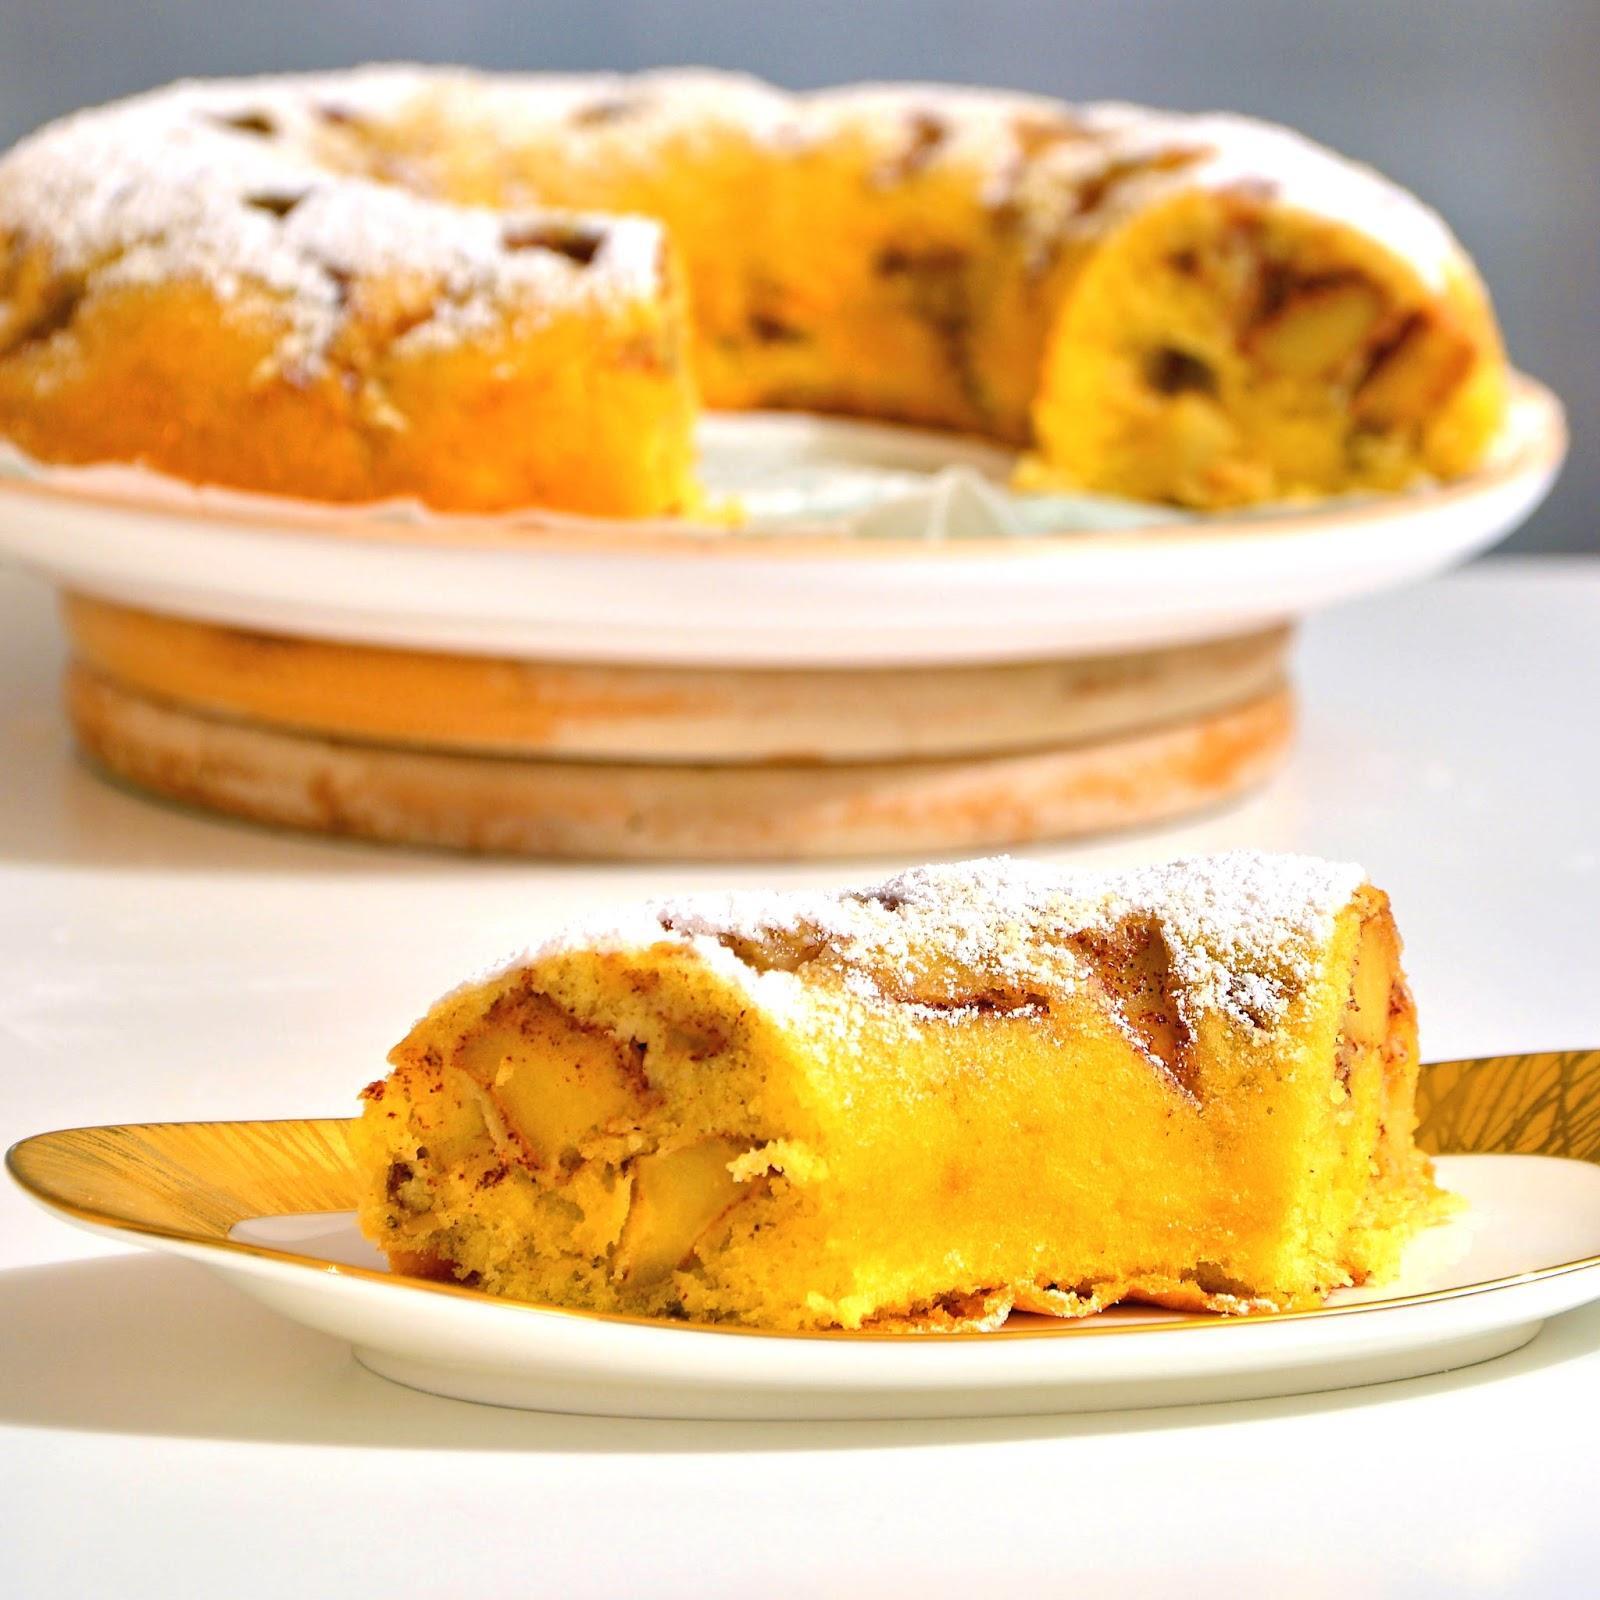 Apple Cinnamon Savarin: The French Bundt Cake